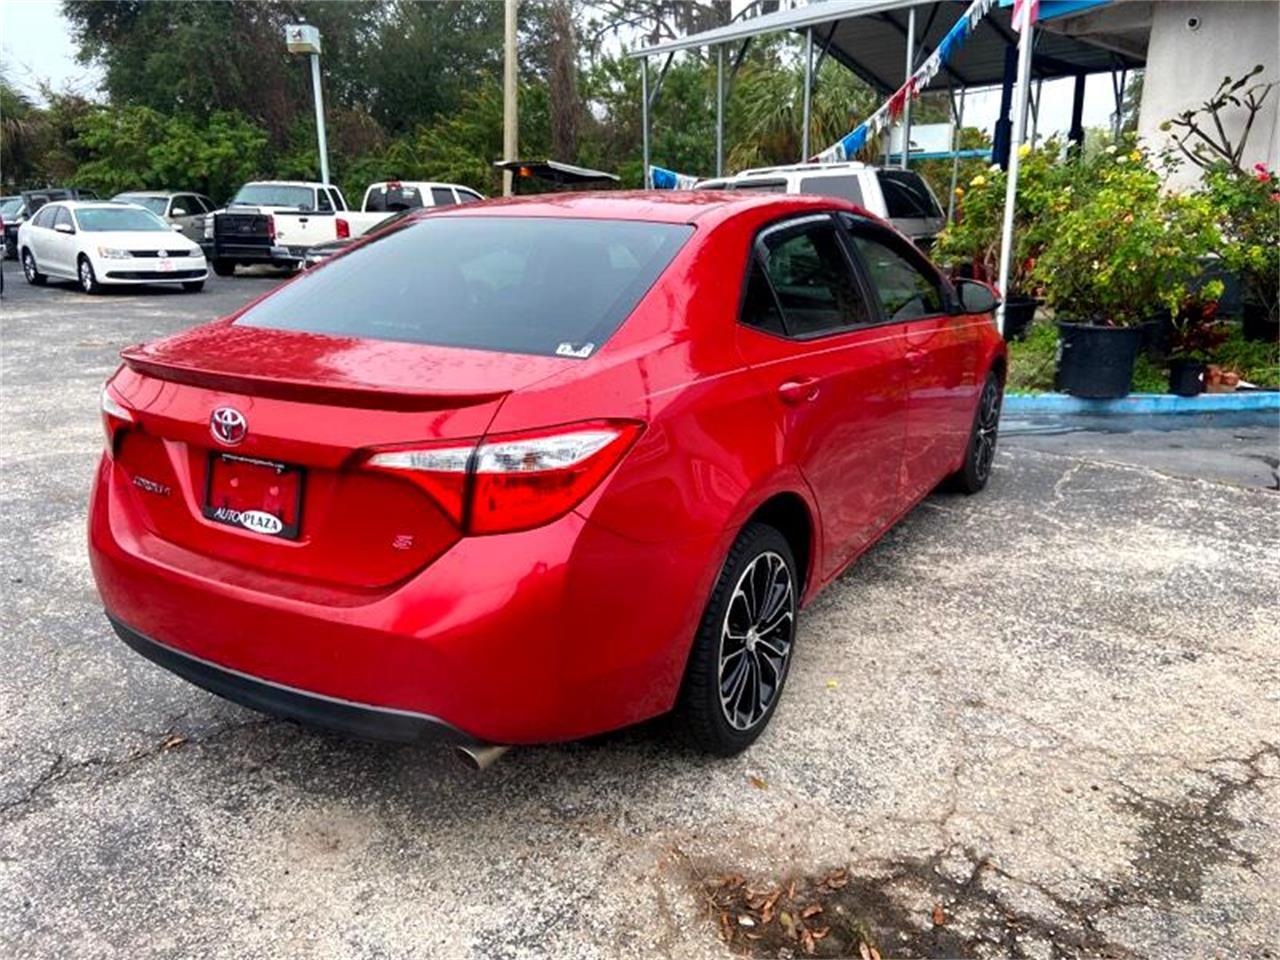 2014 Toyota Corolla (CC-1313548) for sale in Tavares, Florida